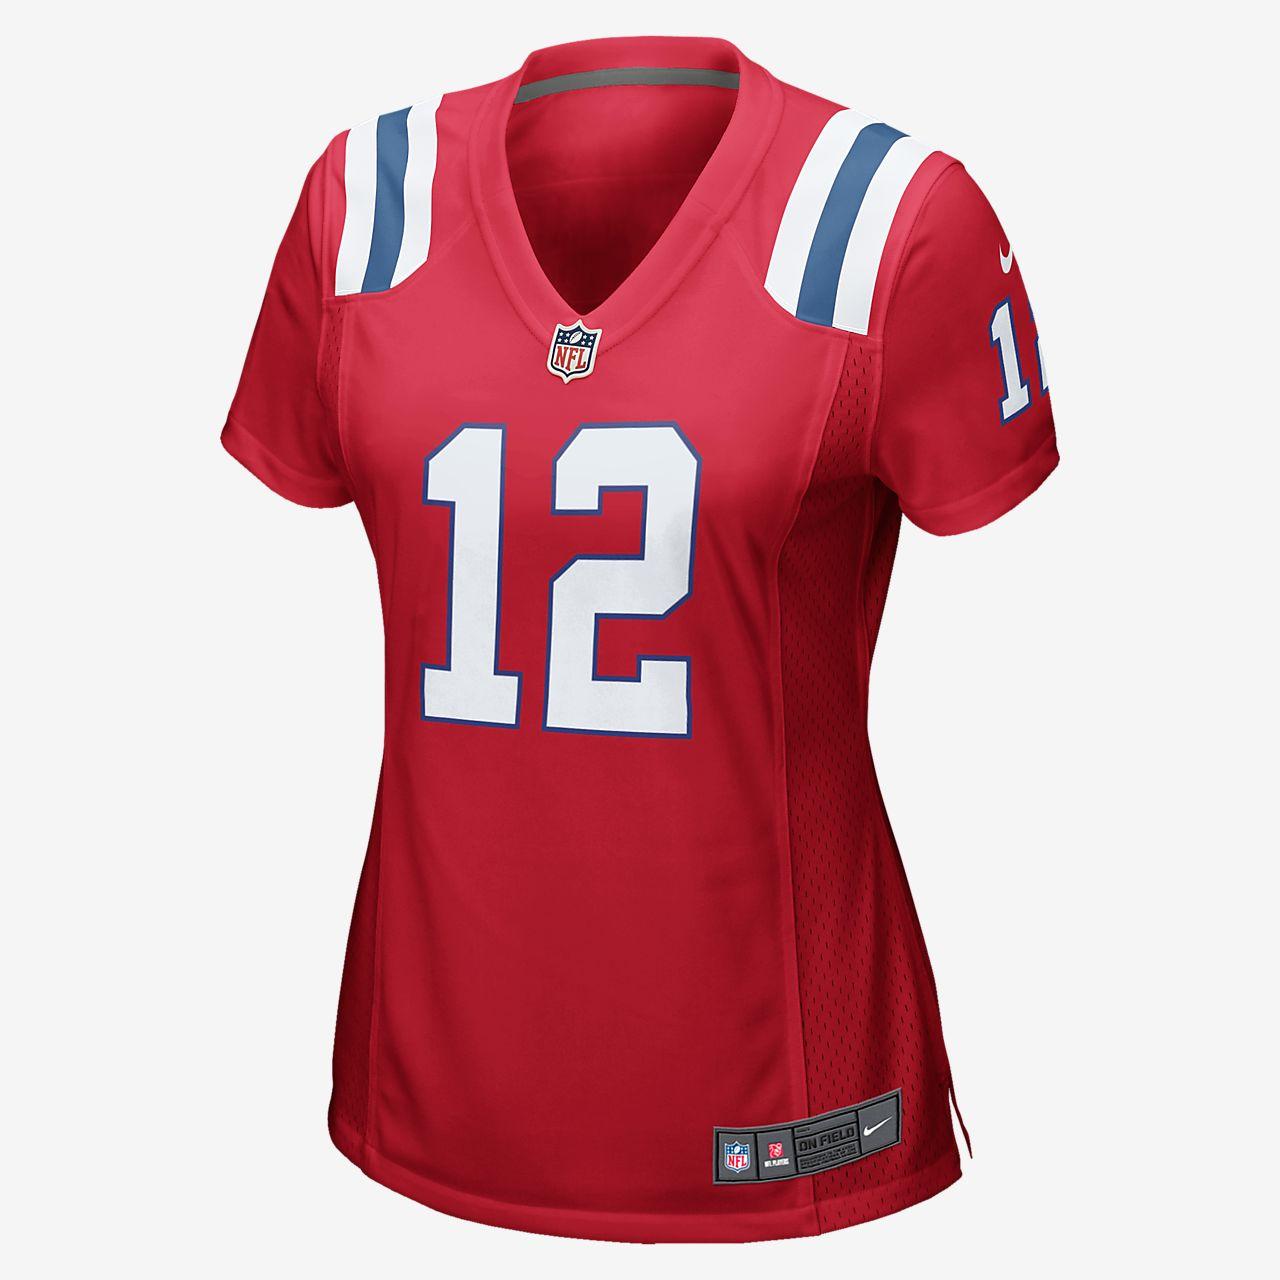 red tom brady jersey women's